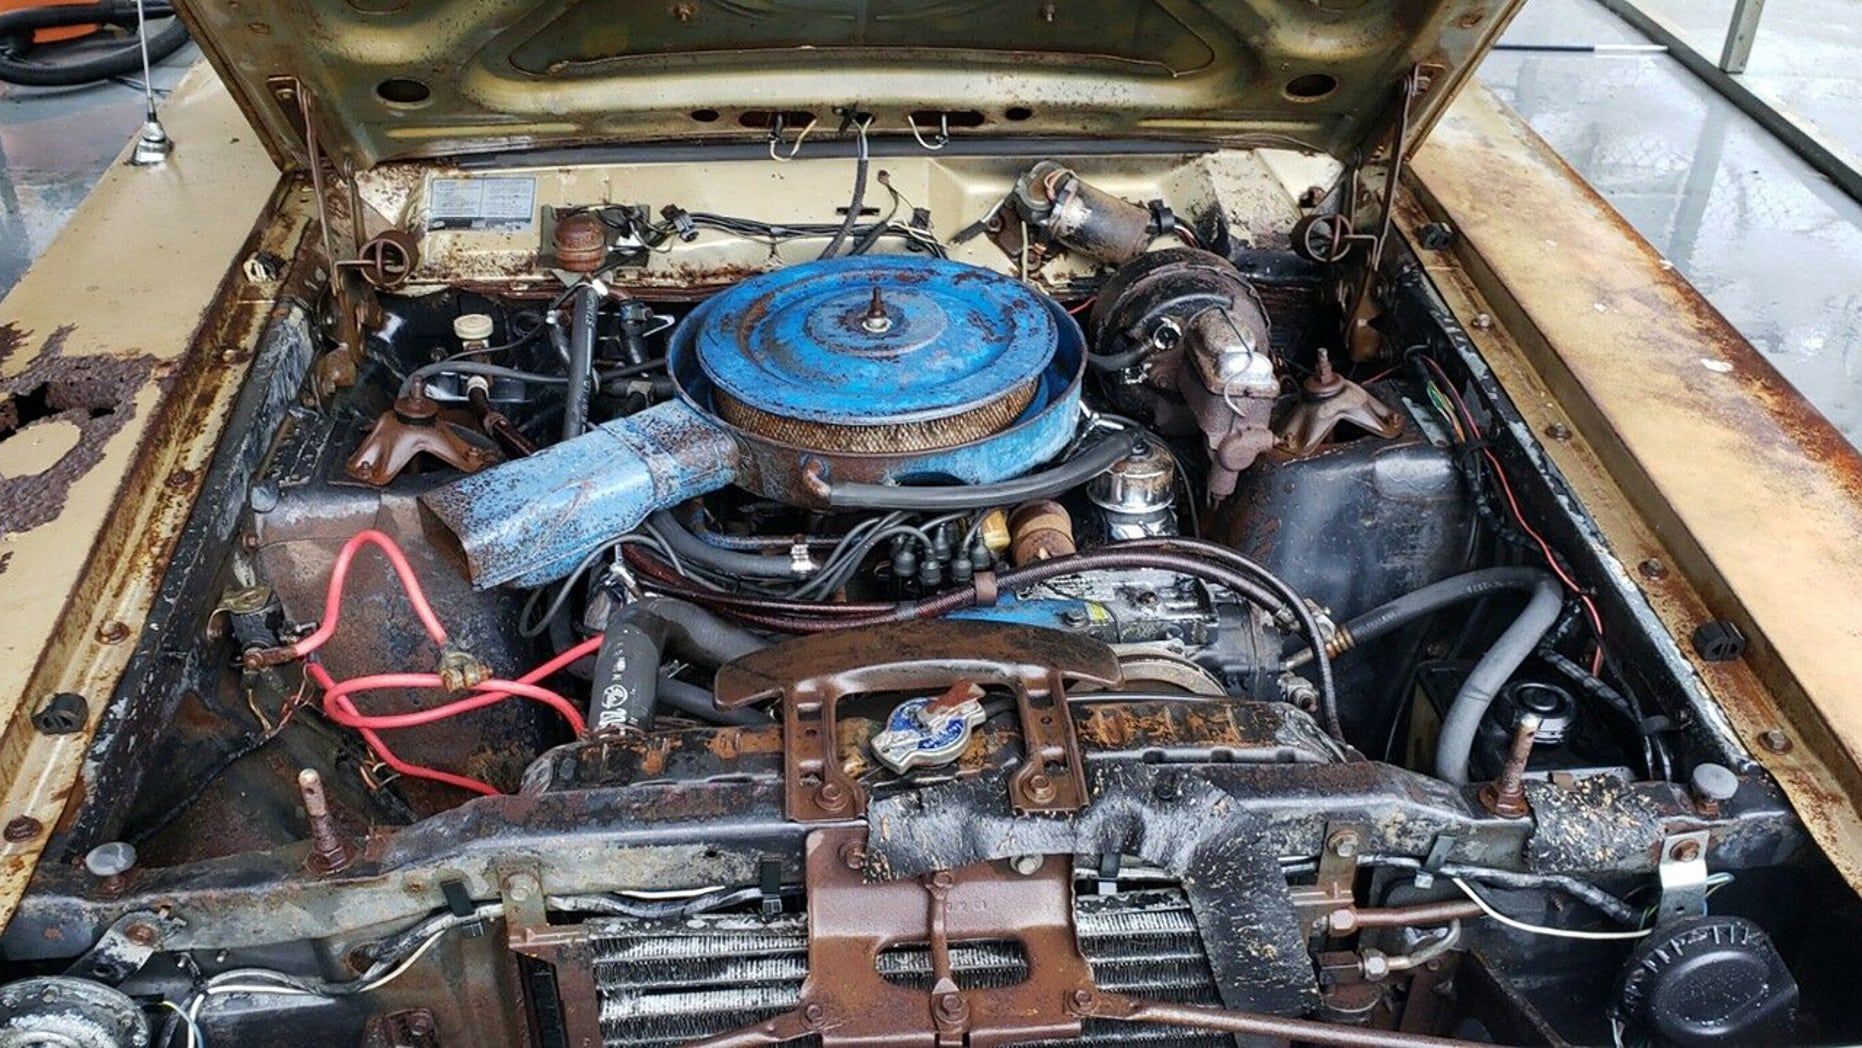 1969 Ford Torino GT Cobra Jet engine